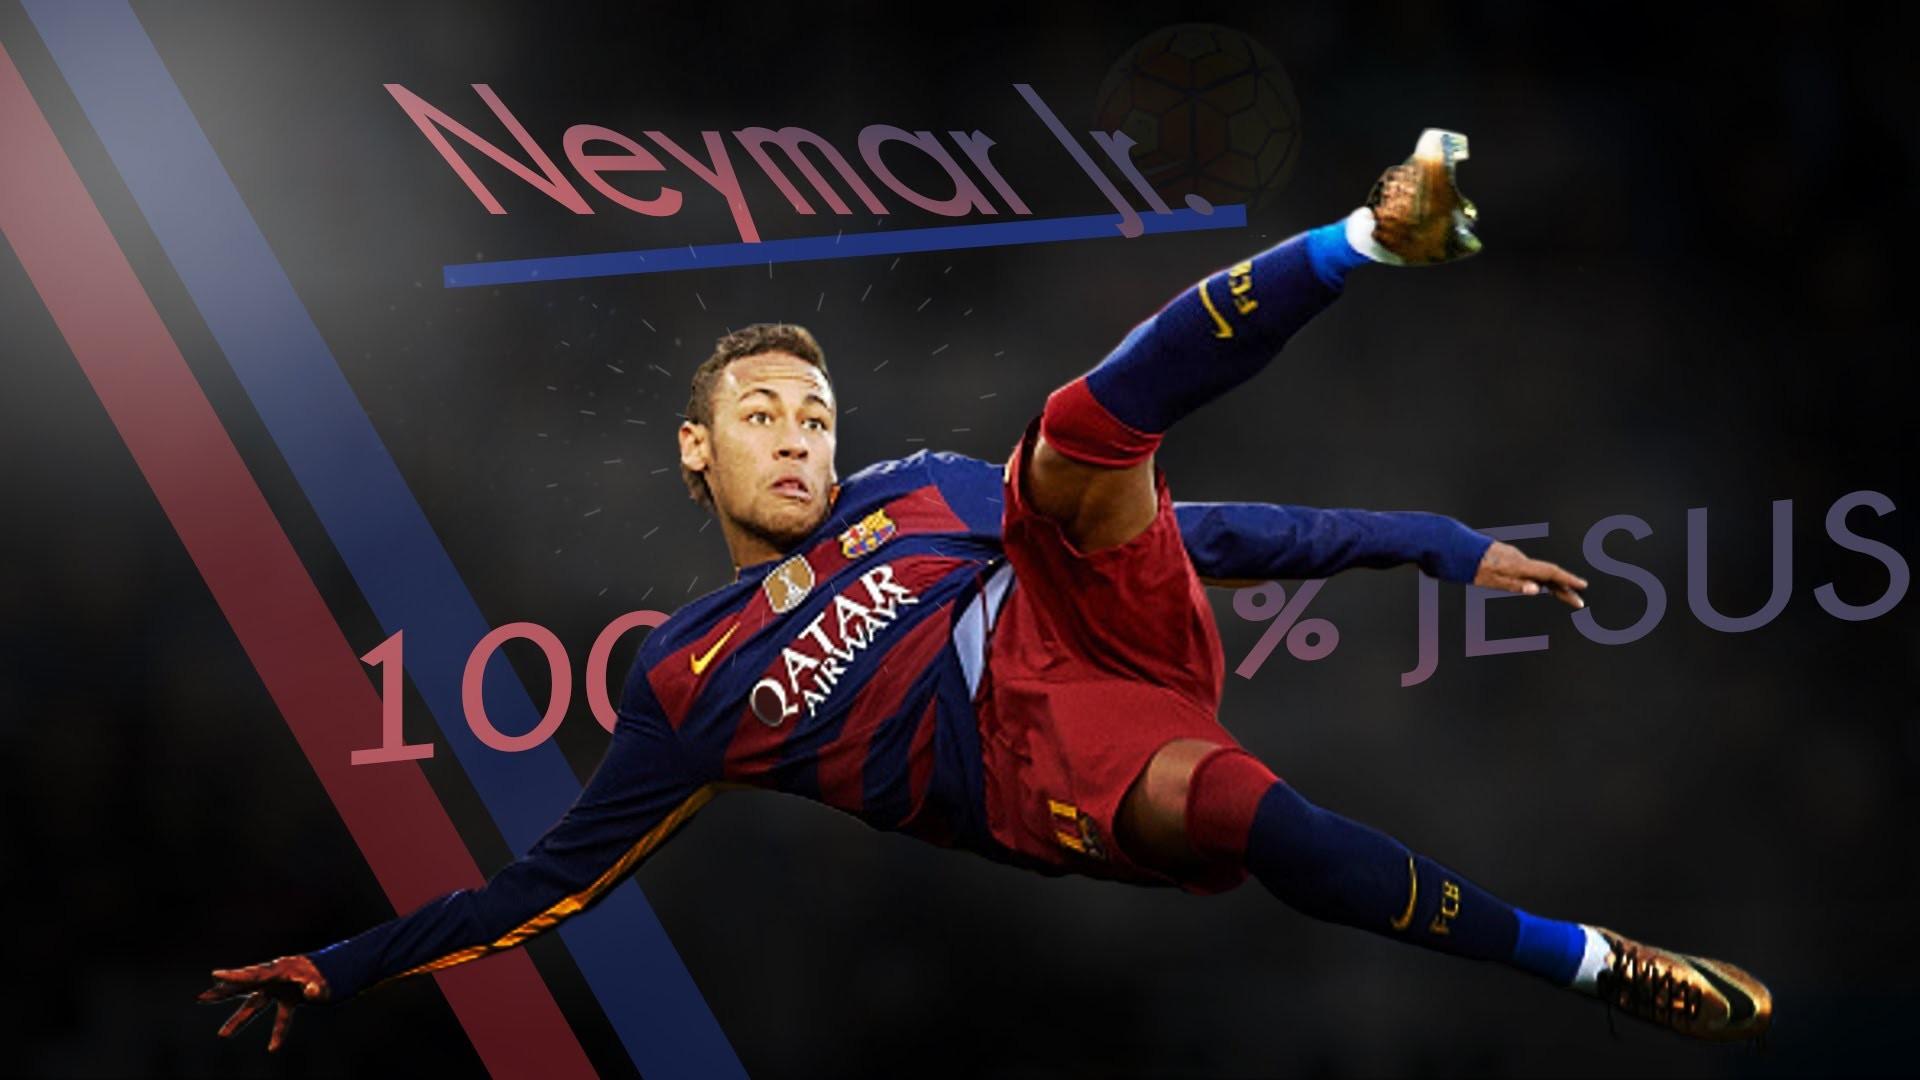 Neymar Jr Wallpaper Speedart